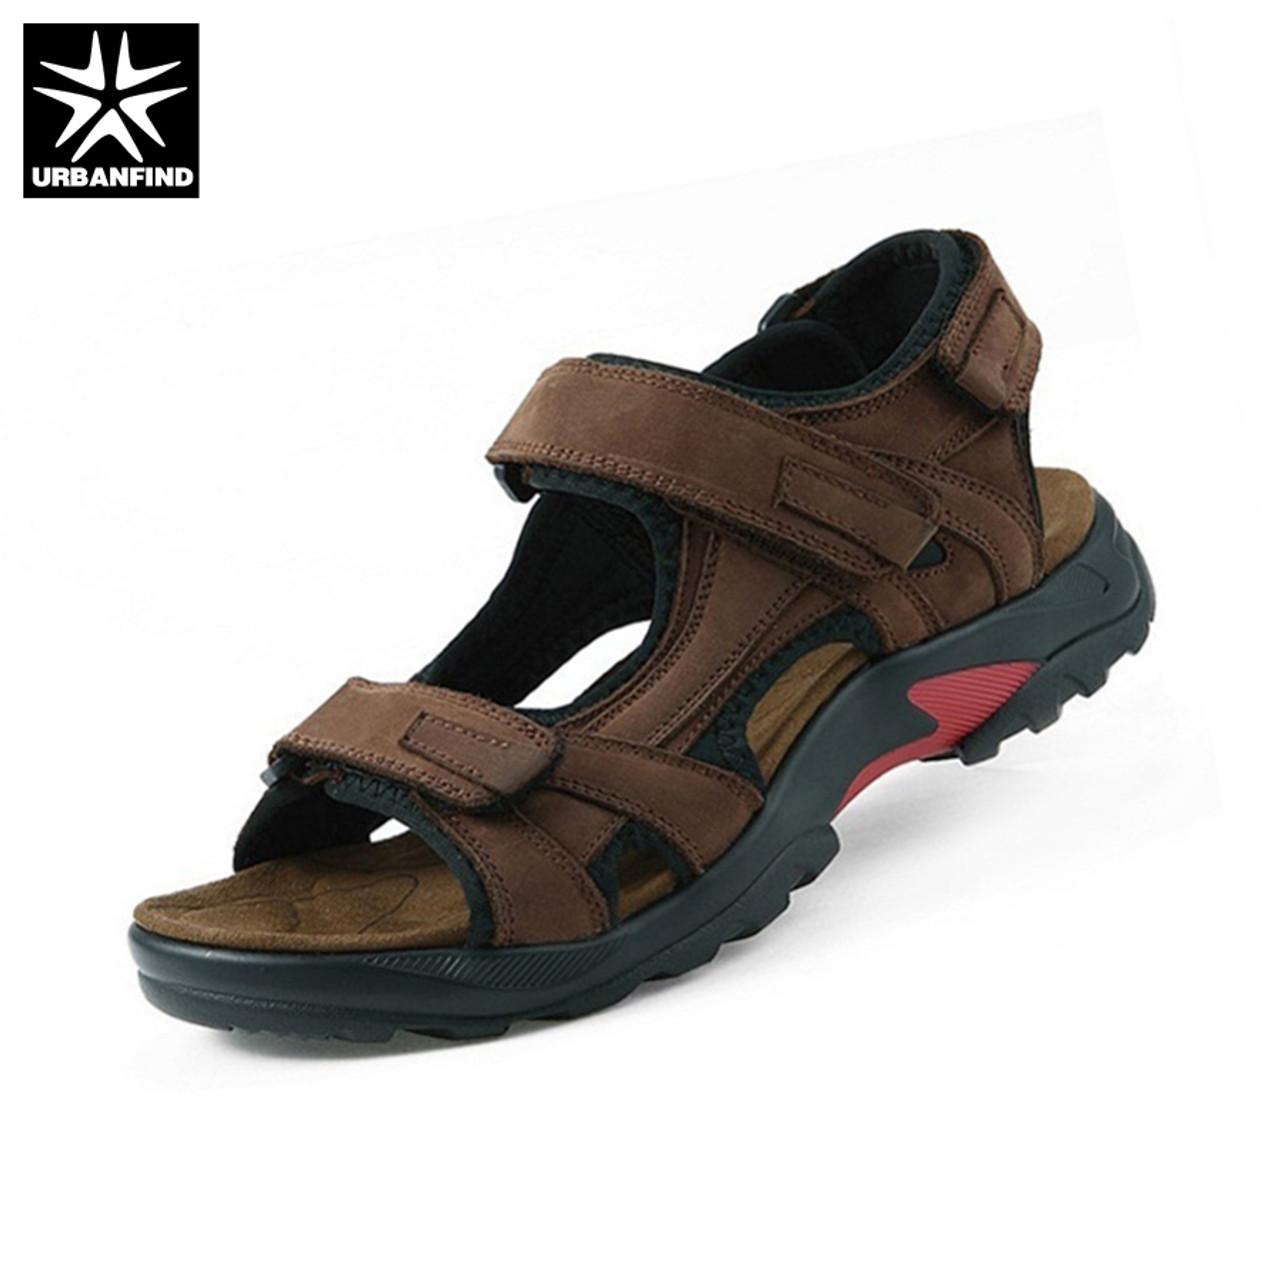 be92b1c13 Top quality sandal men sandals summer genuine leather sandals men outdoor  shoes men leather sandals plus ...